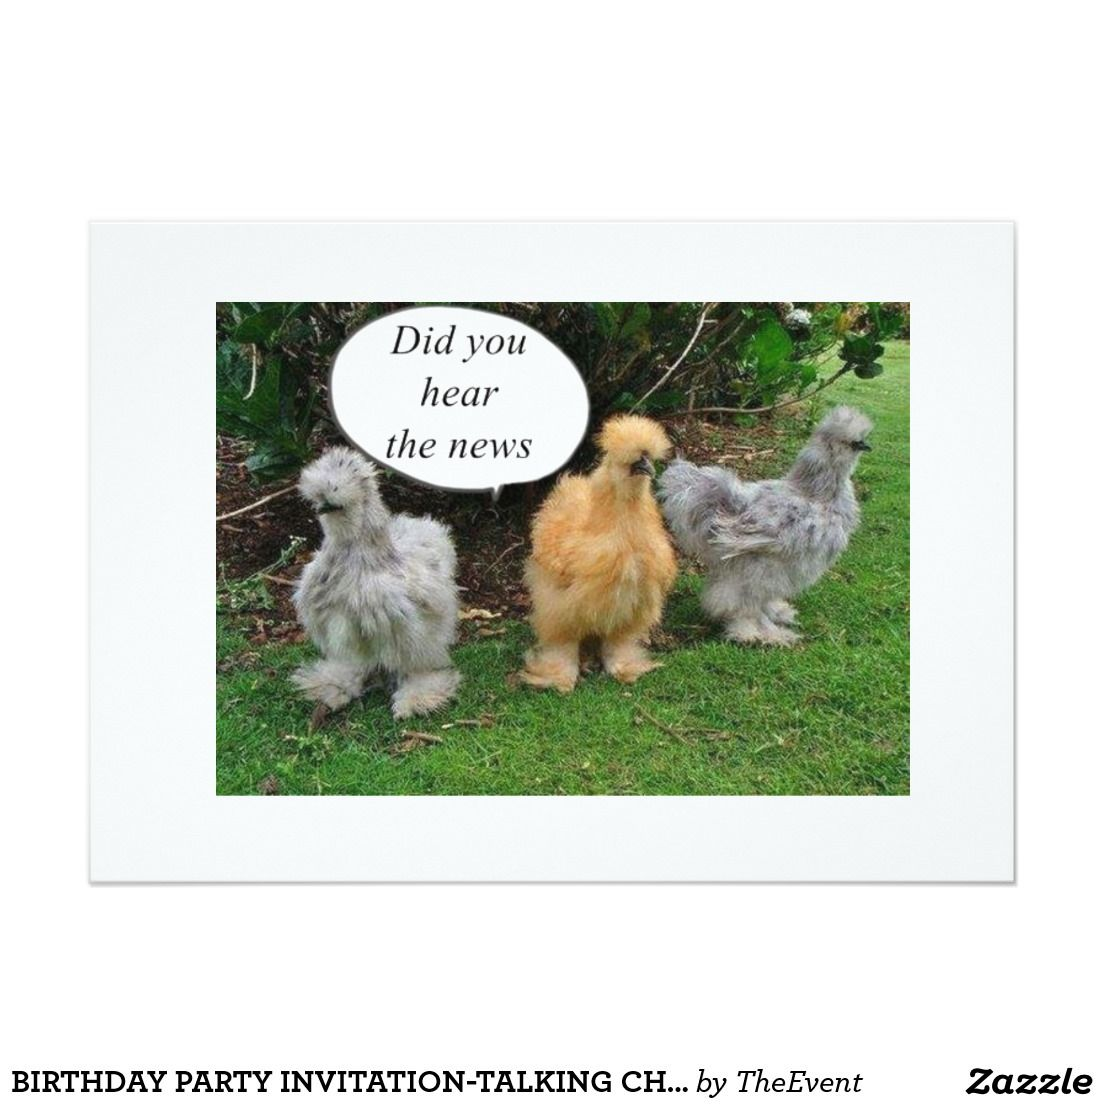 Birthday party invitation talking chickens card chicken parties birthday party invitation talking chickens card kristyandbryce Gallery